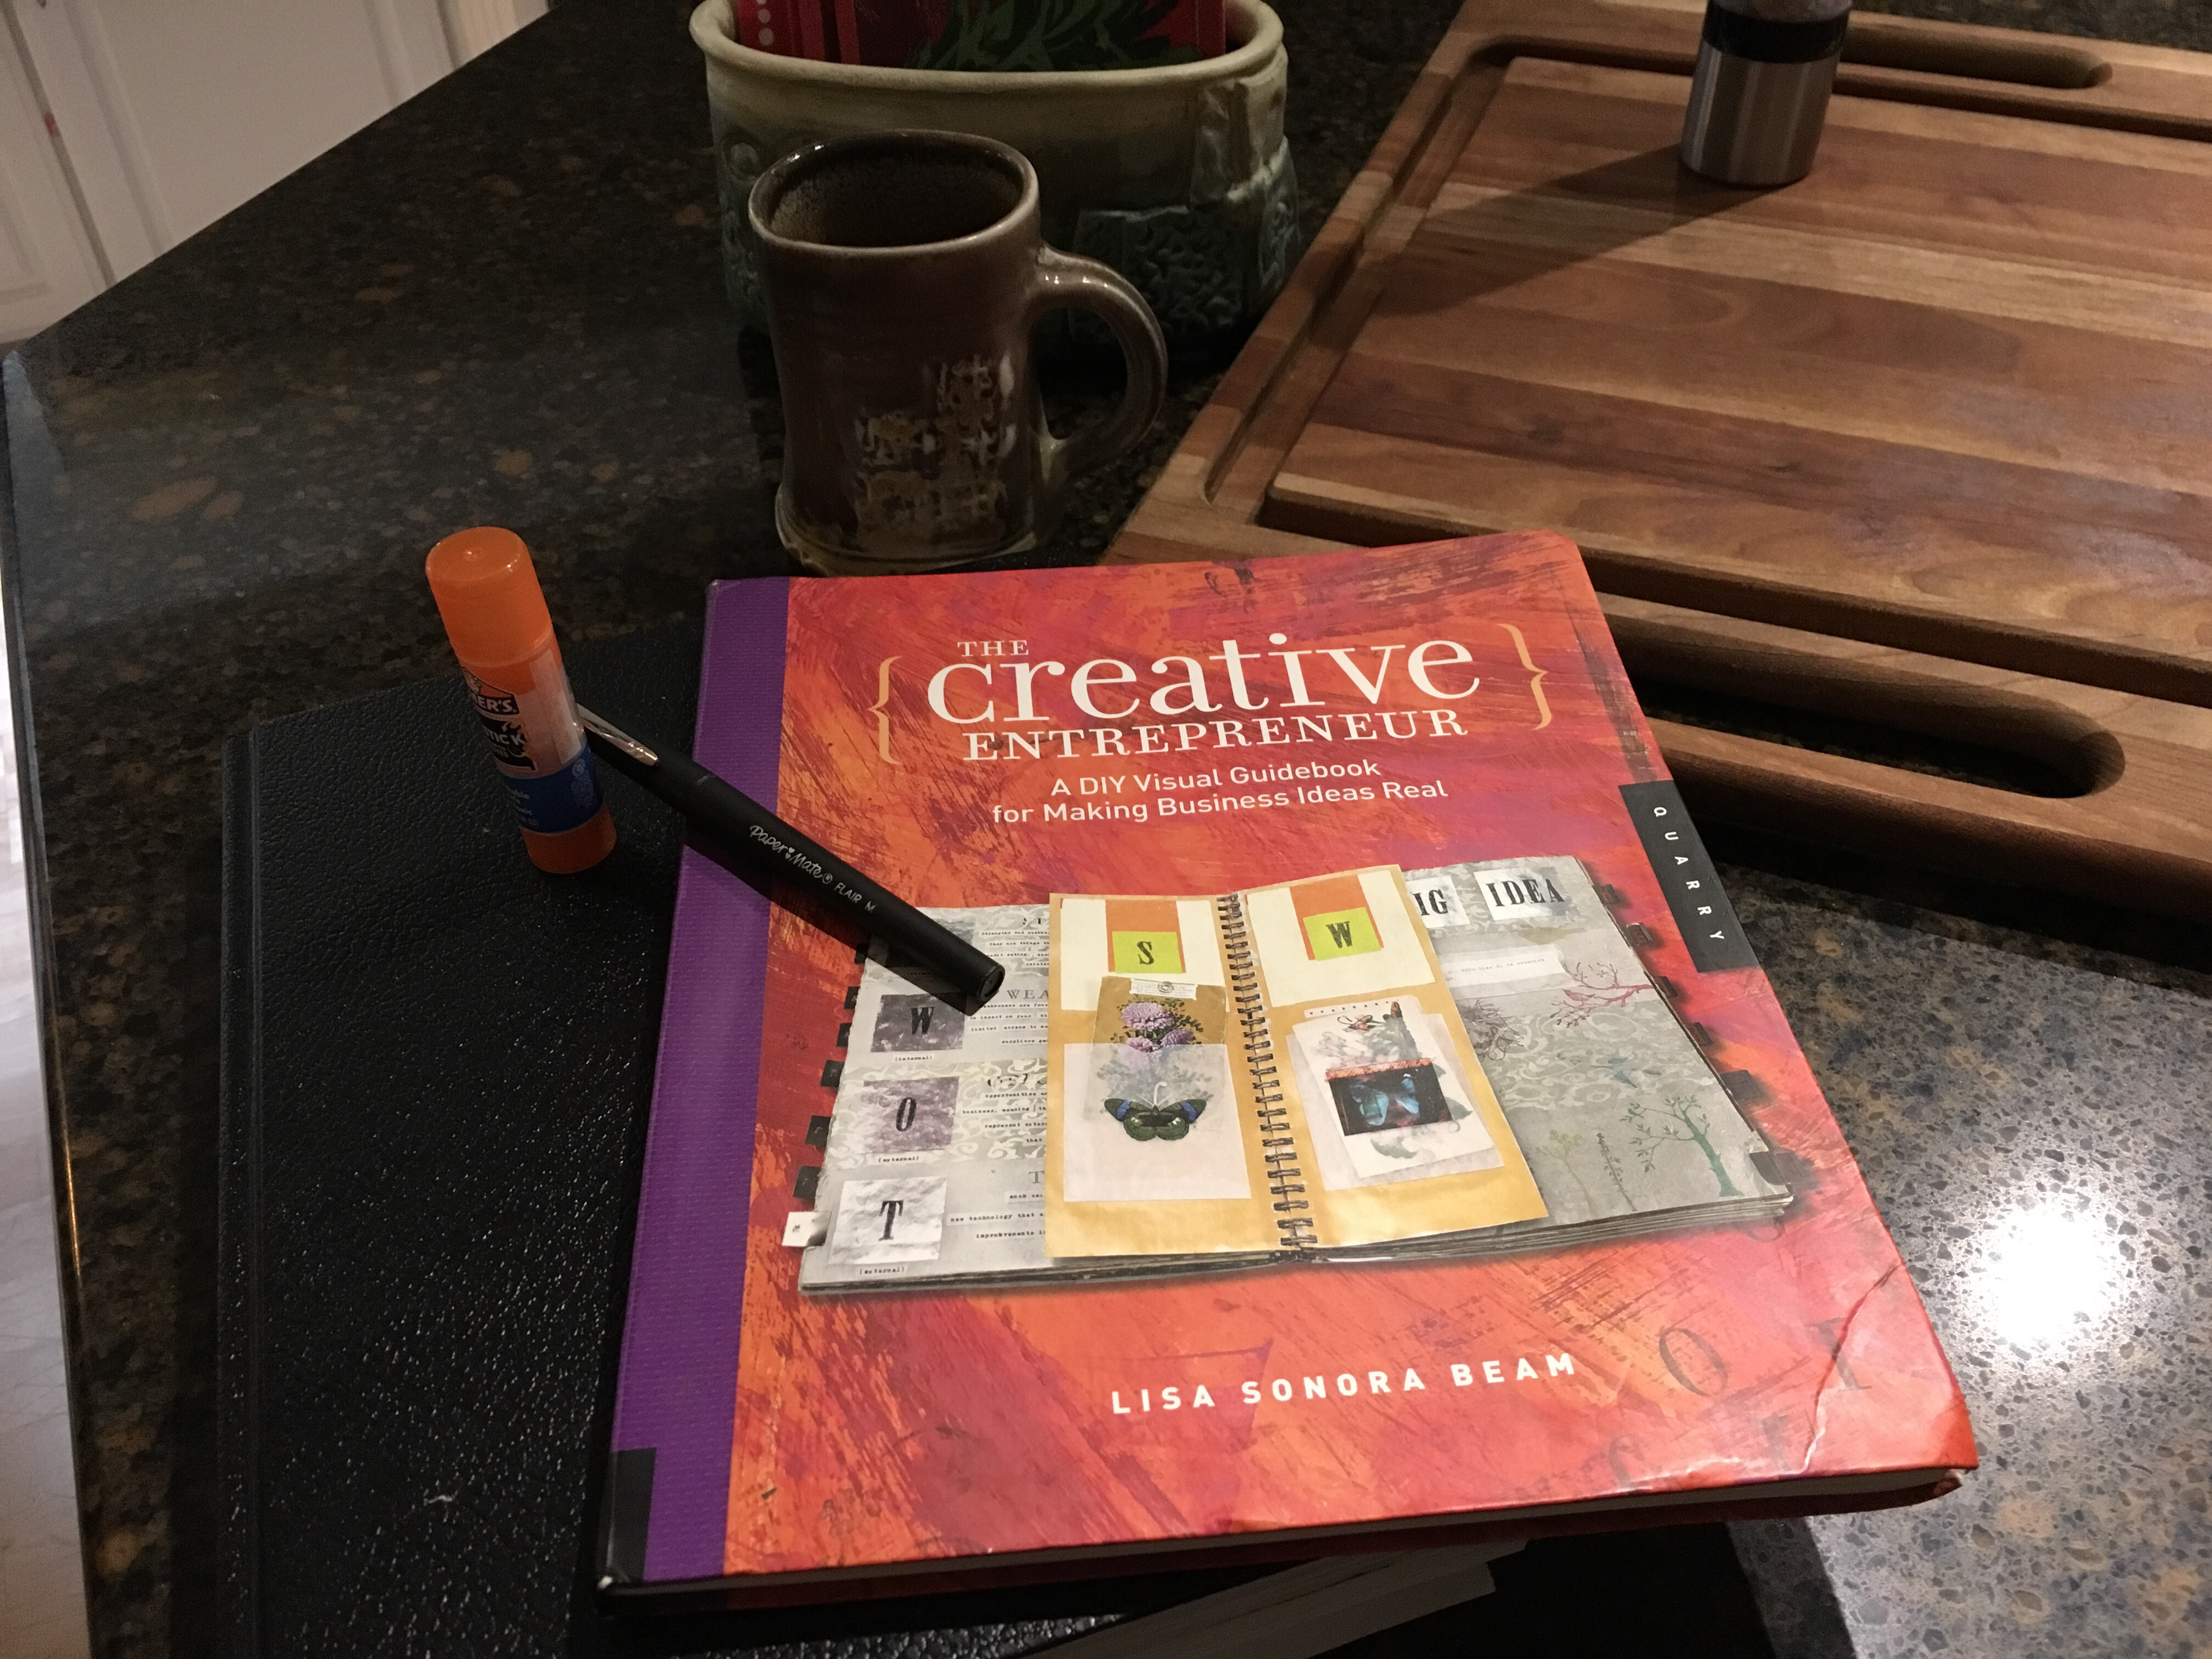 The creative entrepreneur by lisa Sonora beam